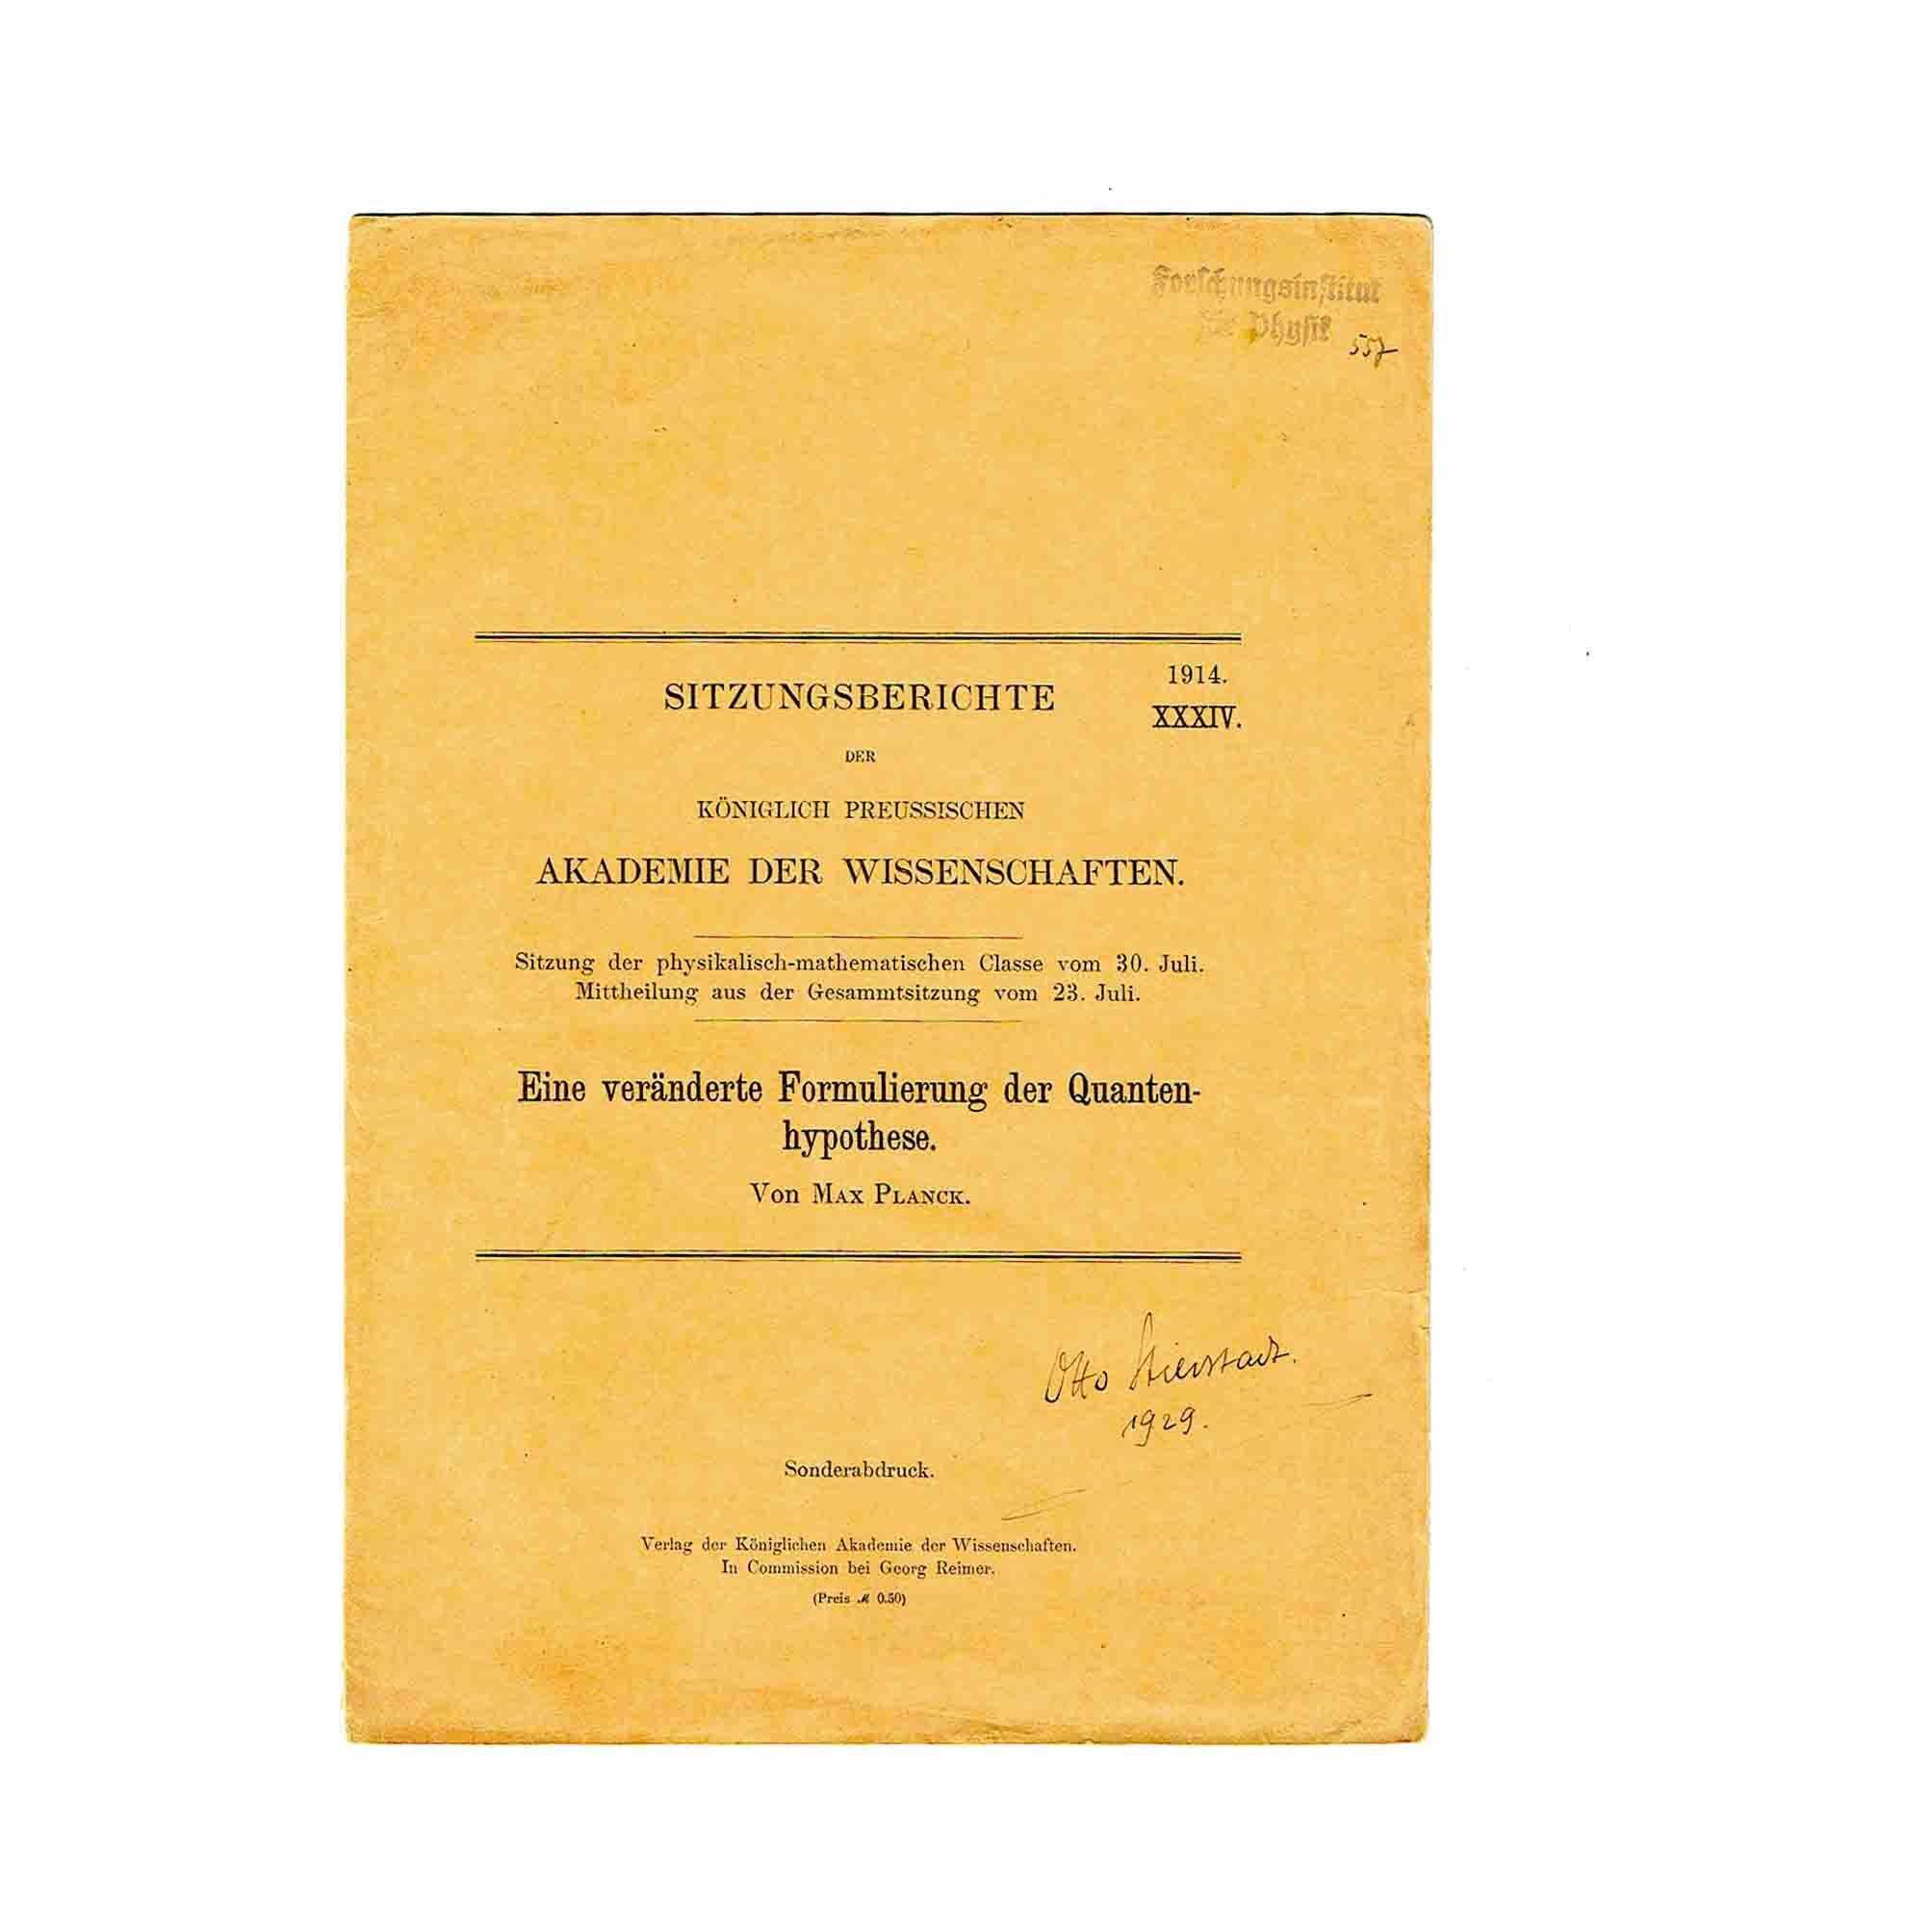 5817 Planck Verändert Quantenhypothese Offprint 1914 Umschlag recto free N